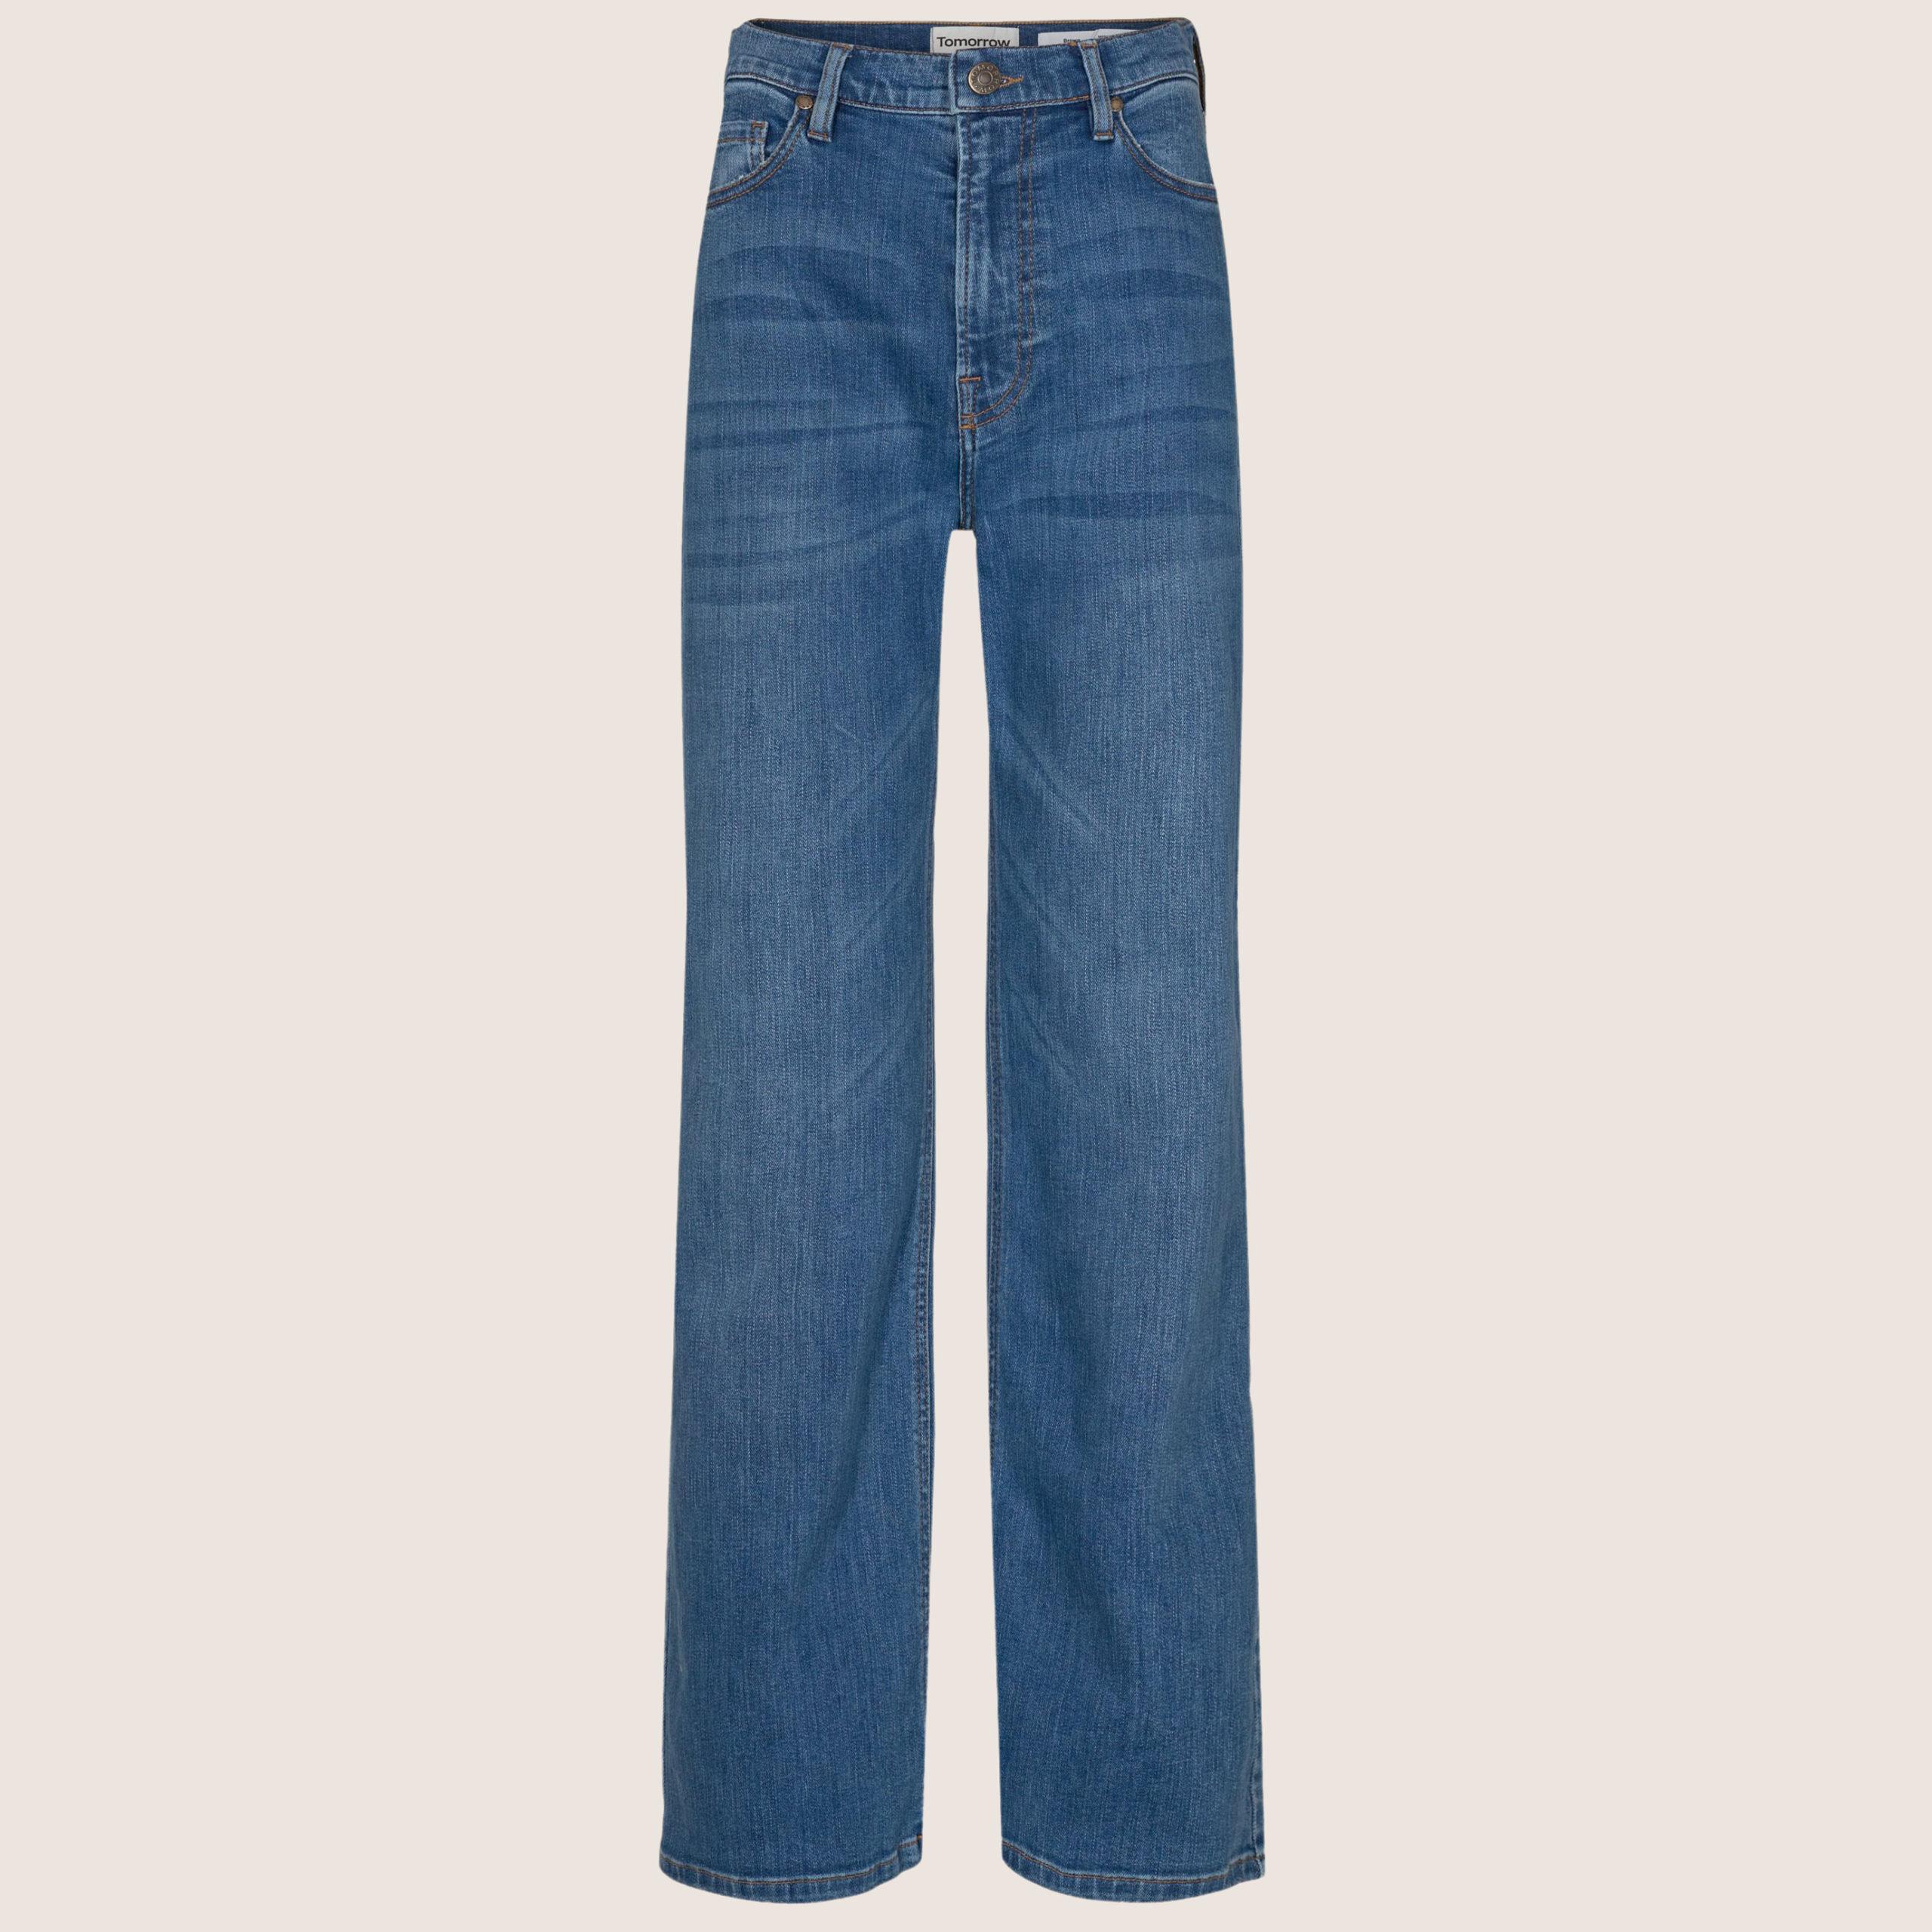 Brown Straight Jeans - Prato